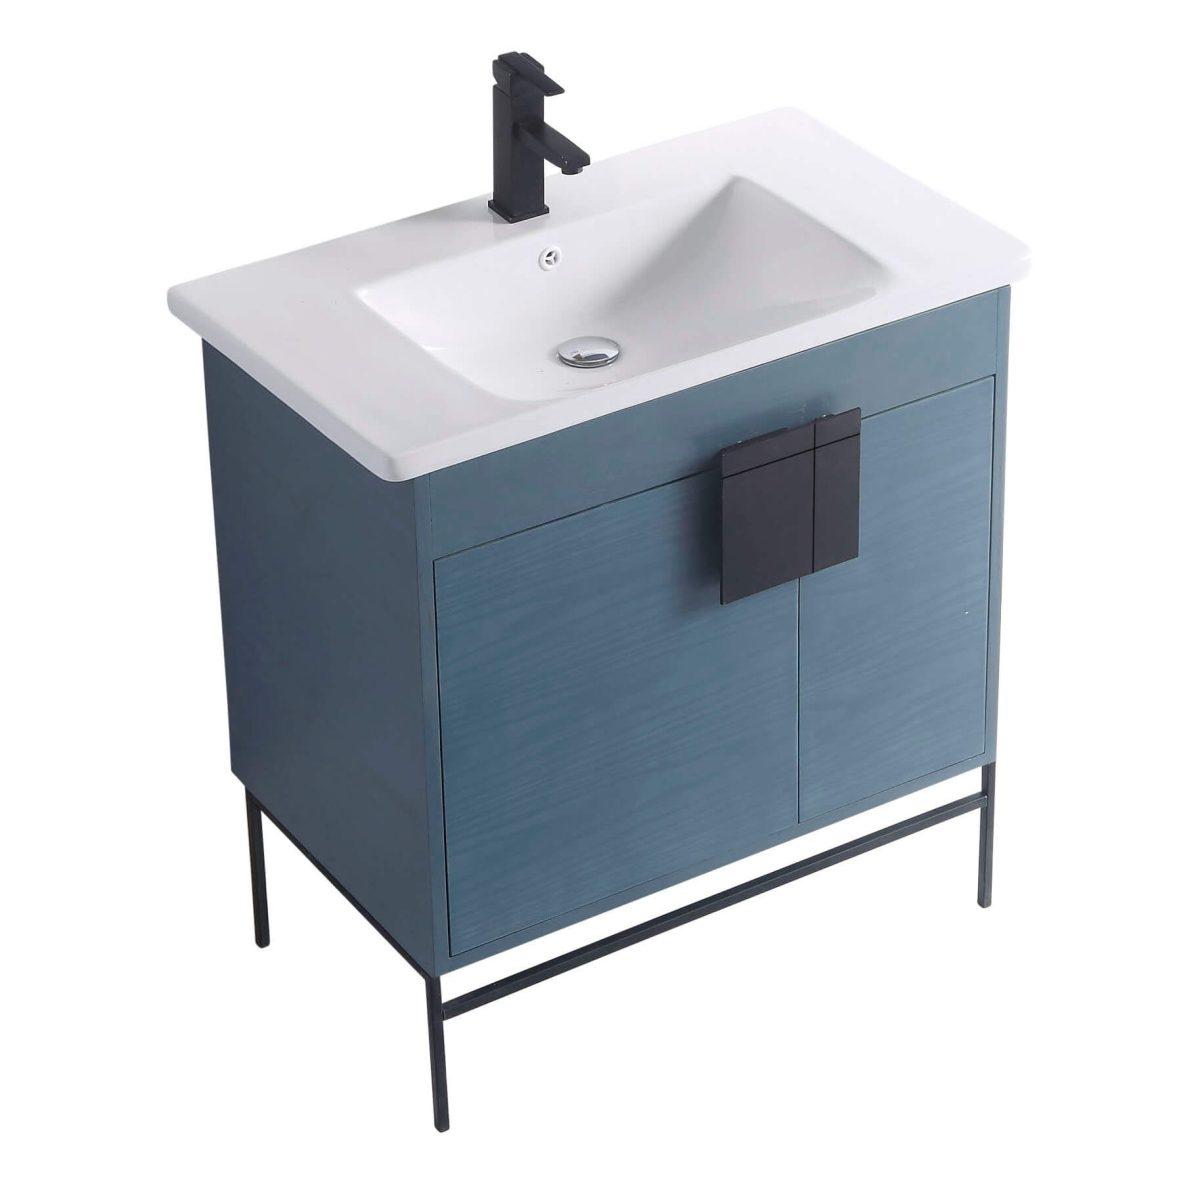 "Shawbridge 30"" Modern Bathroom Vanity  French Blue with Black Hardware"